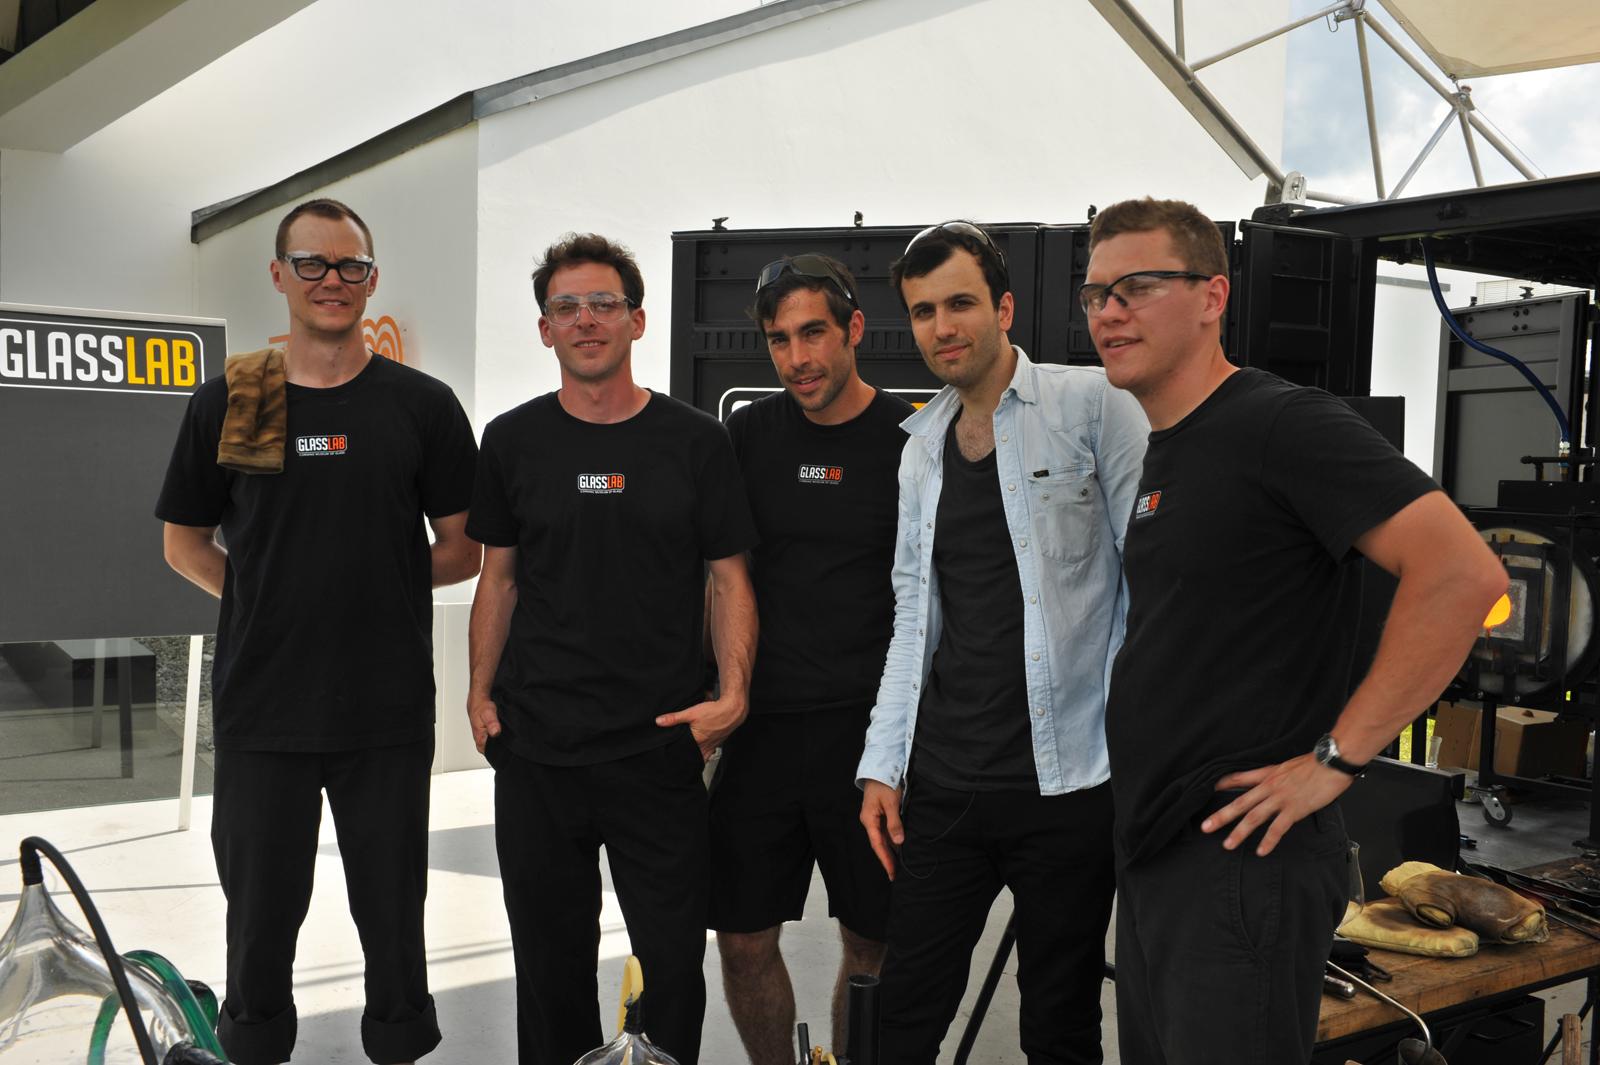 Designer Paul Cocksedge with the GlassLab team